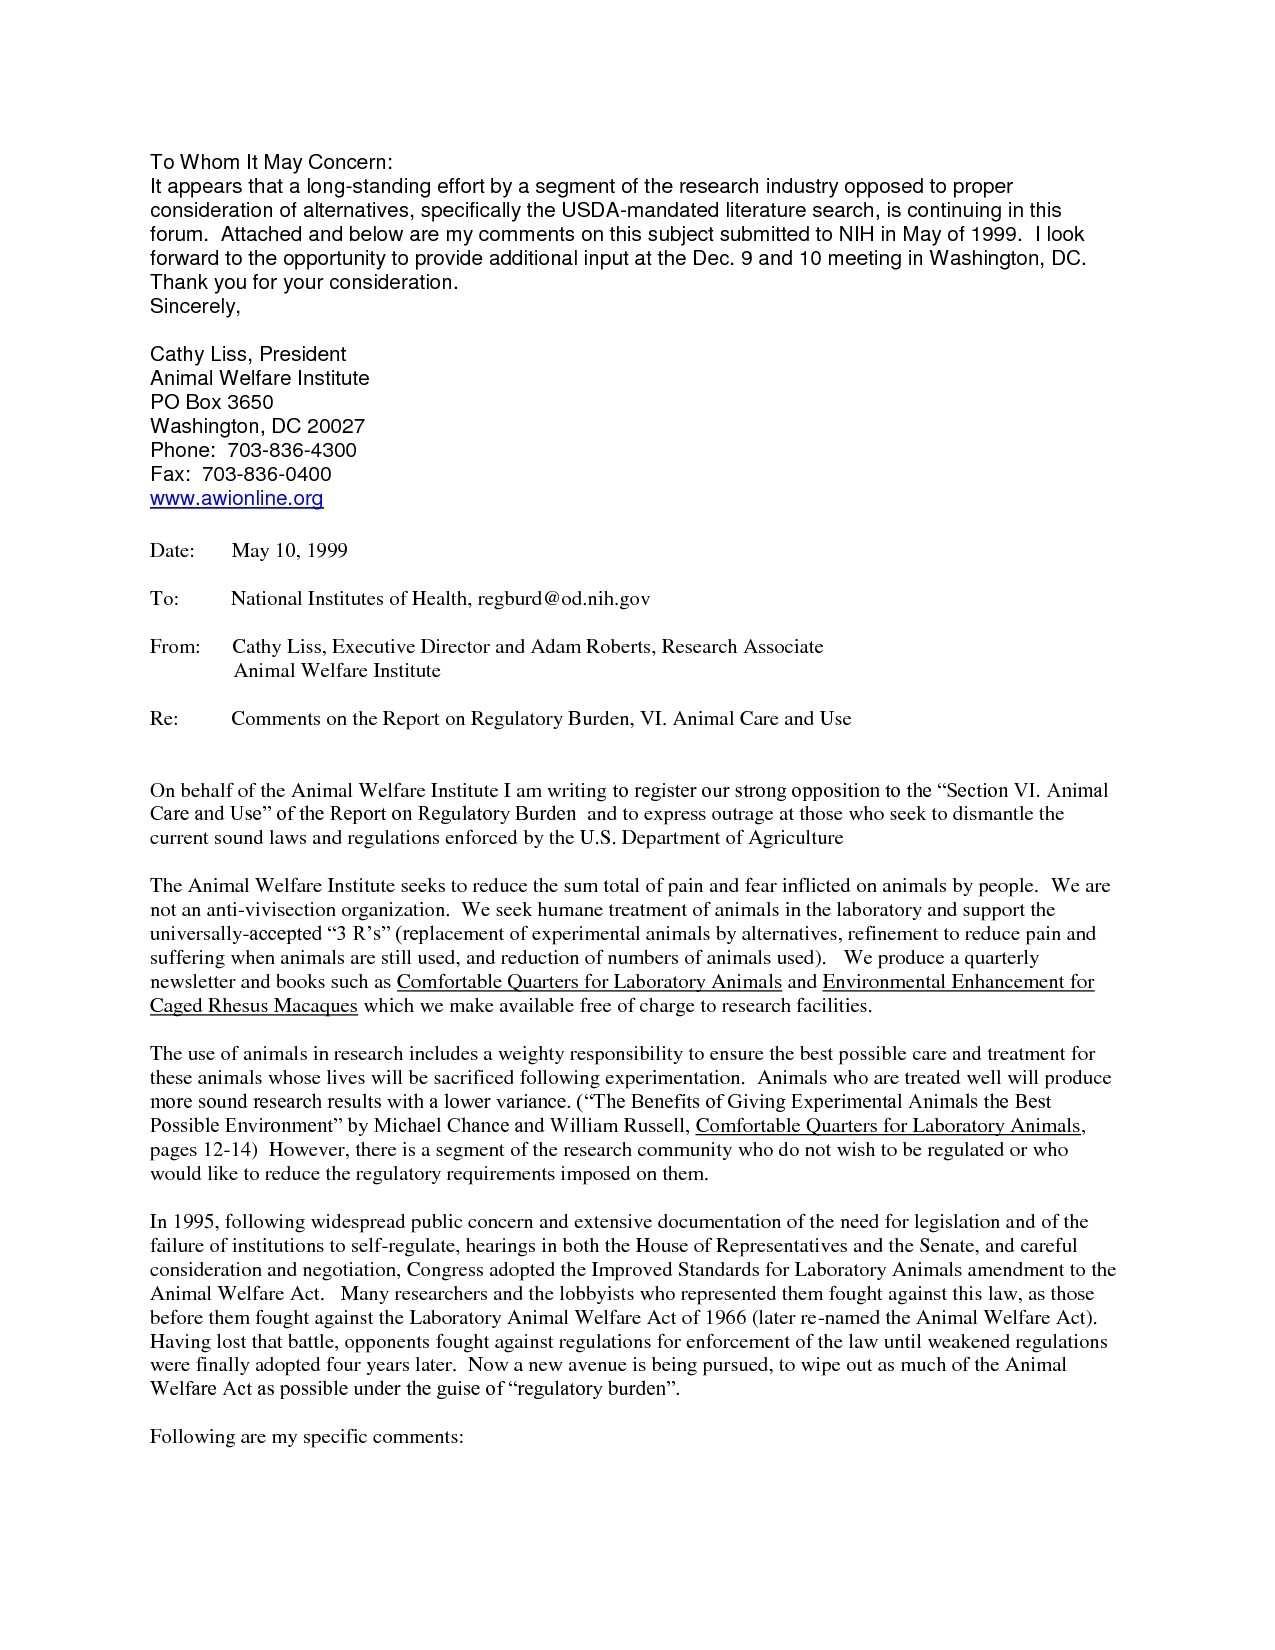 Esa Template Letter - Unique Esa Letter Sample G4f – Professional Letter